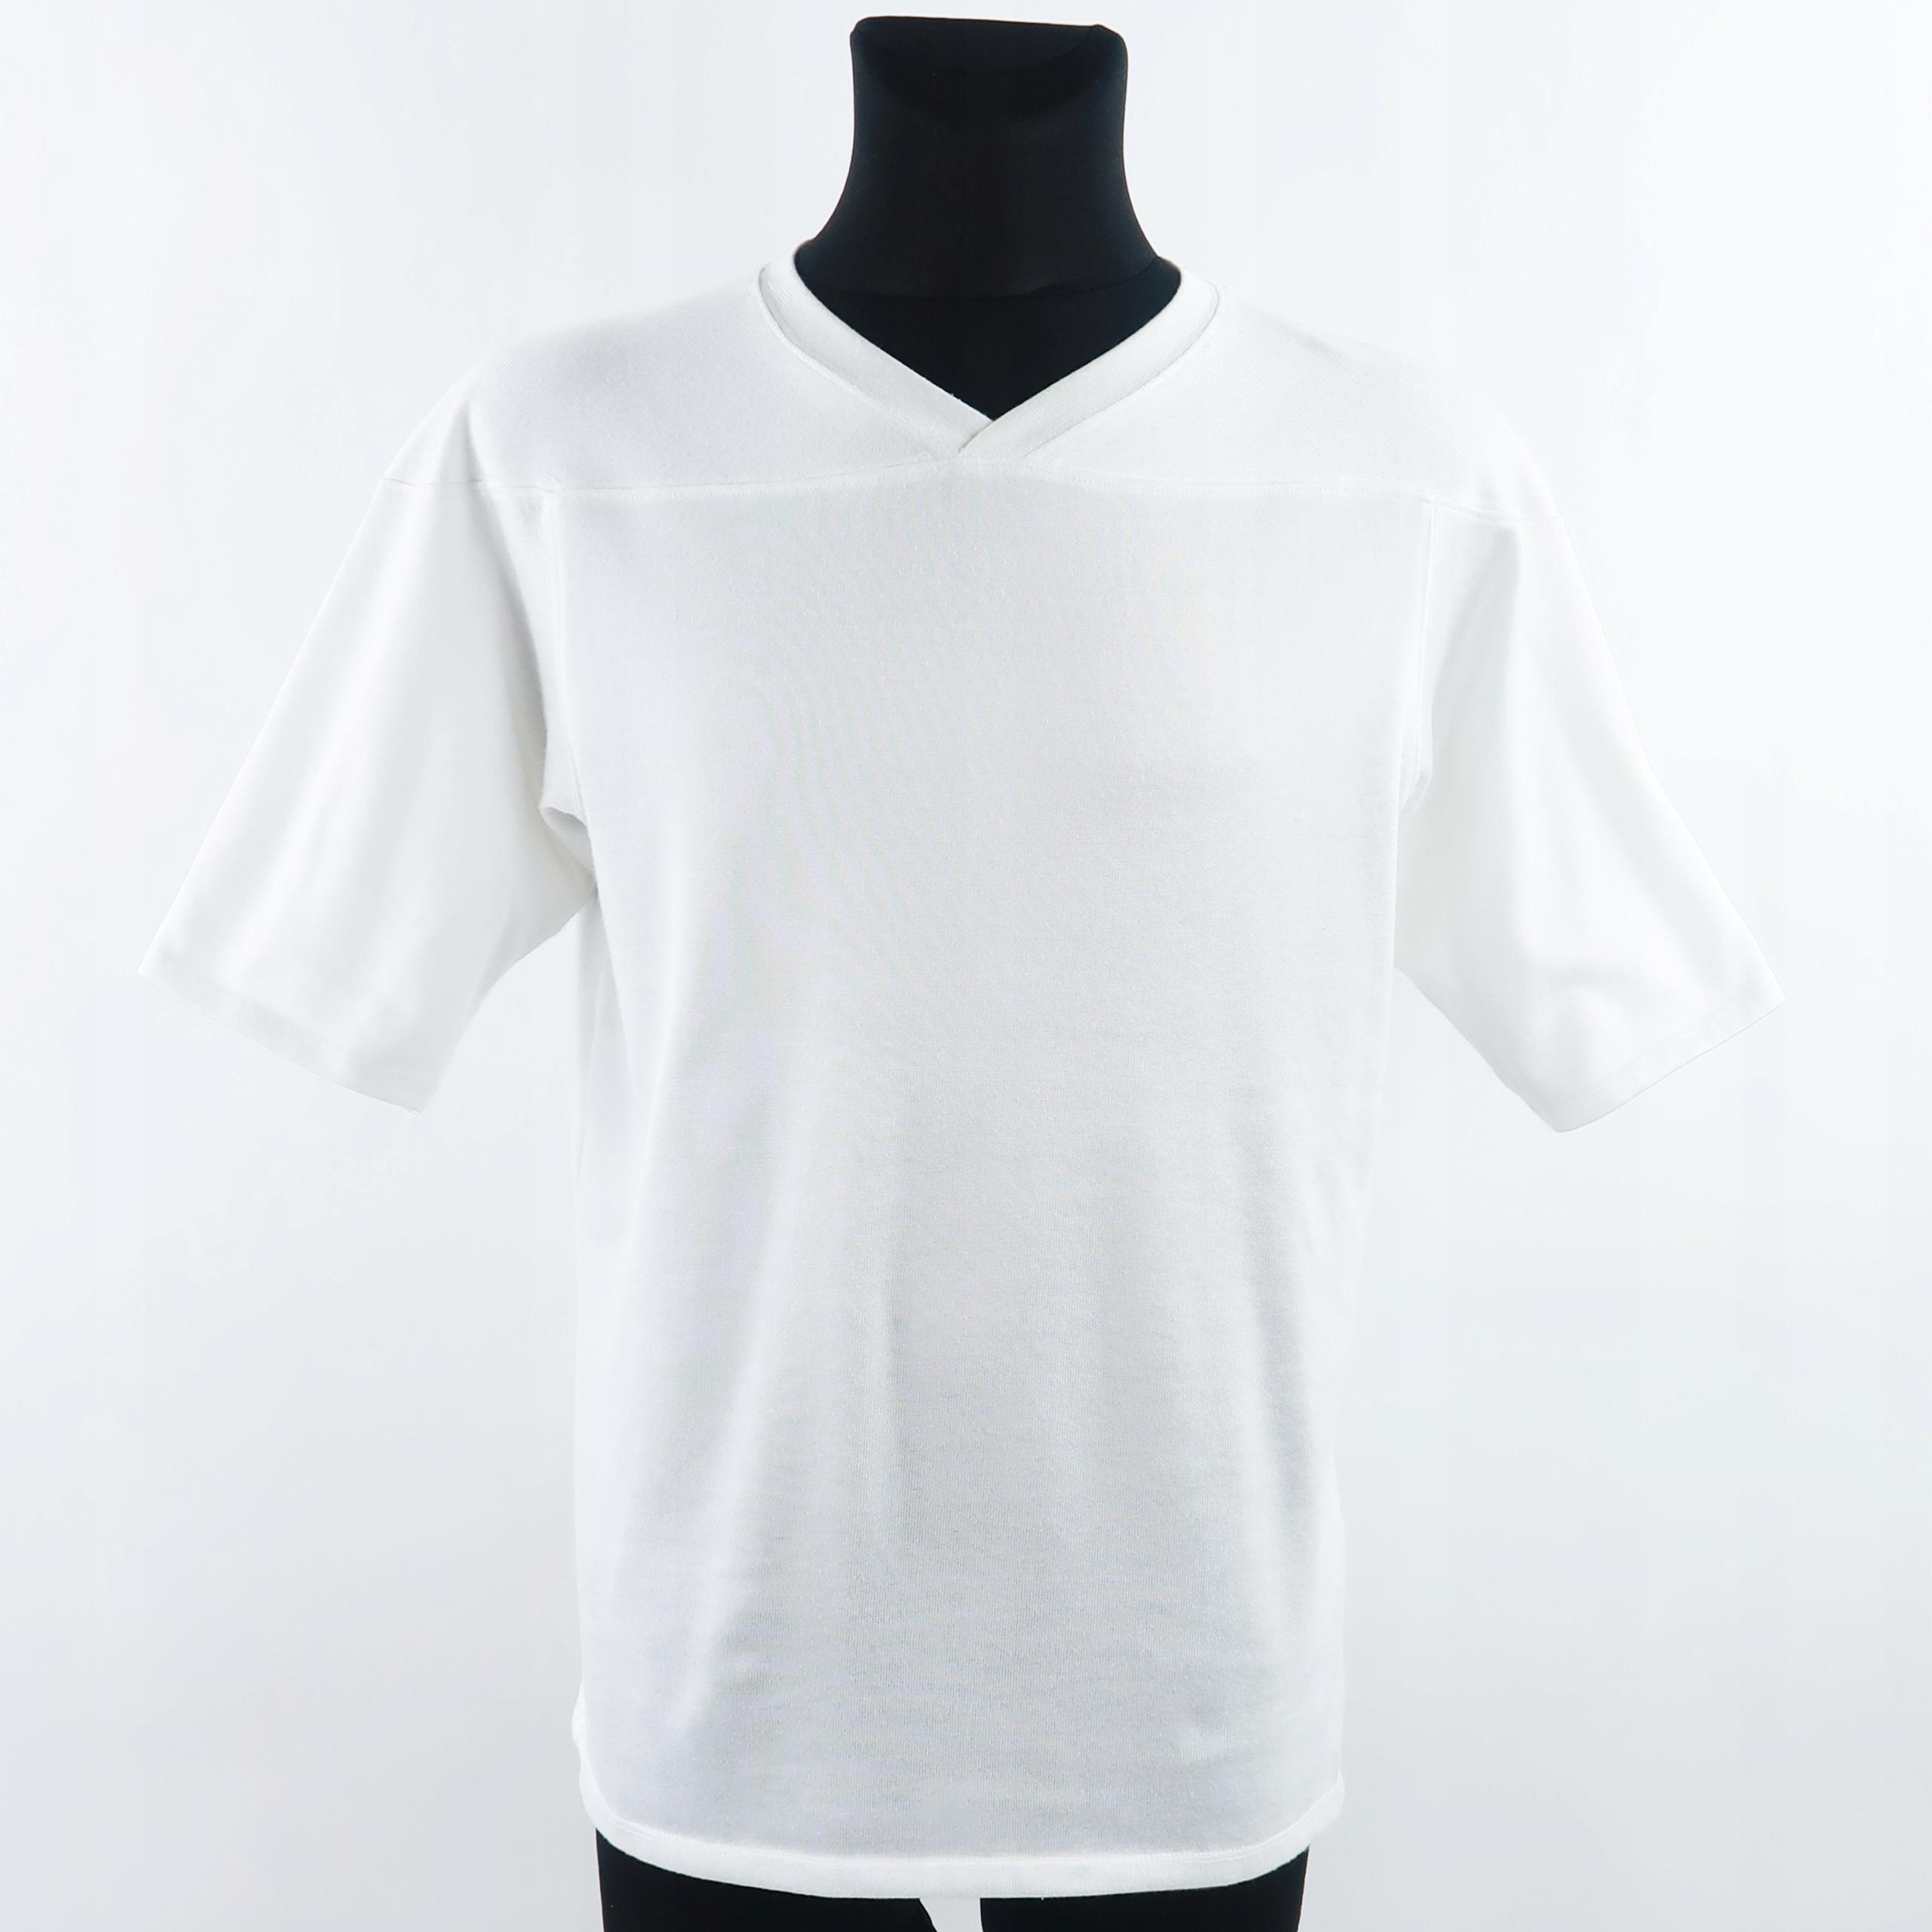 625f97be T-shirt męski Zara 40 L - 7821735179 - oficjalne archiwum allegro